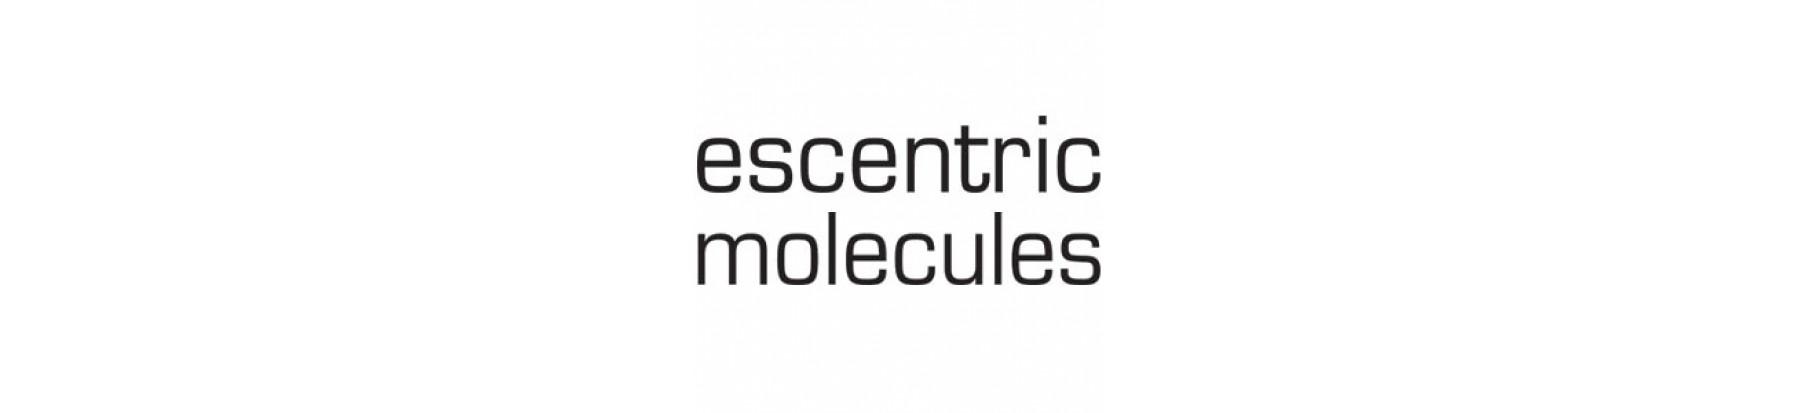 Эксцентрик Молекула 02 Molecules Escentric 02 Туалетная вода 100 мл